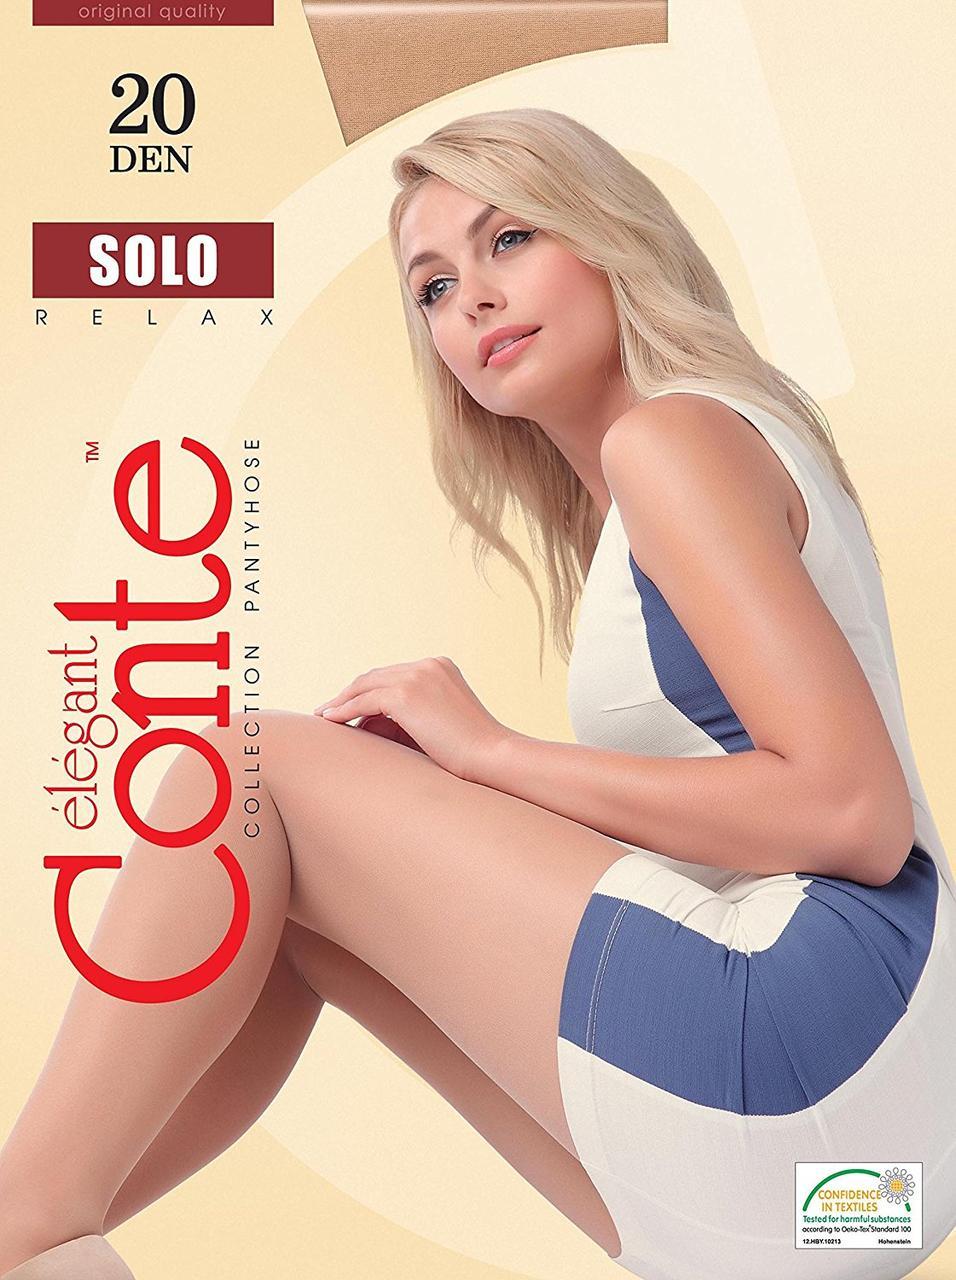 Колготки женские классические Conte SOLO 20